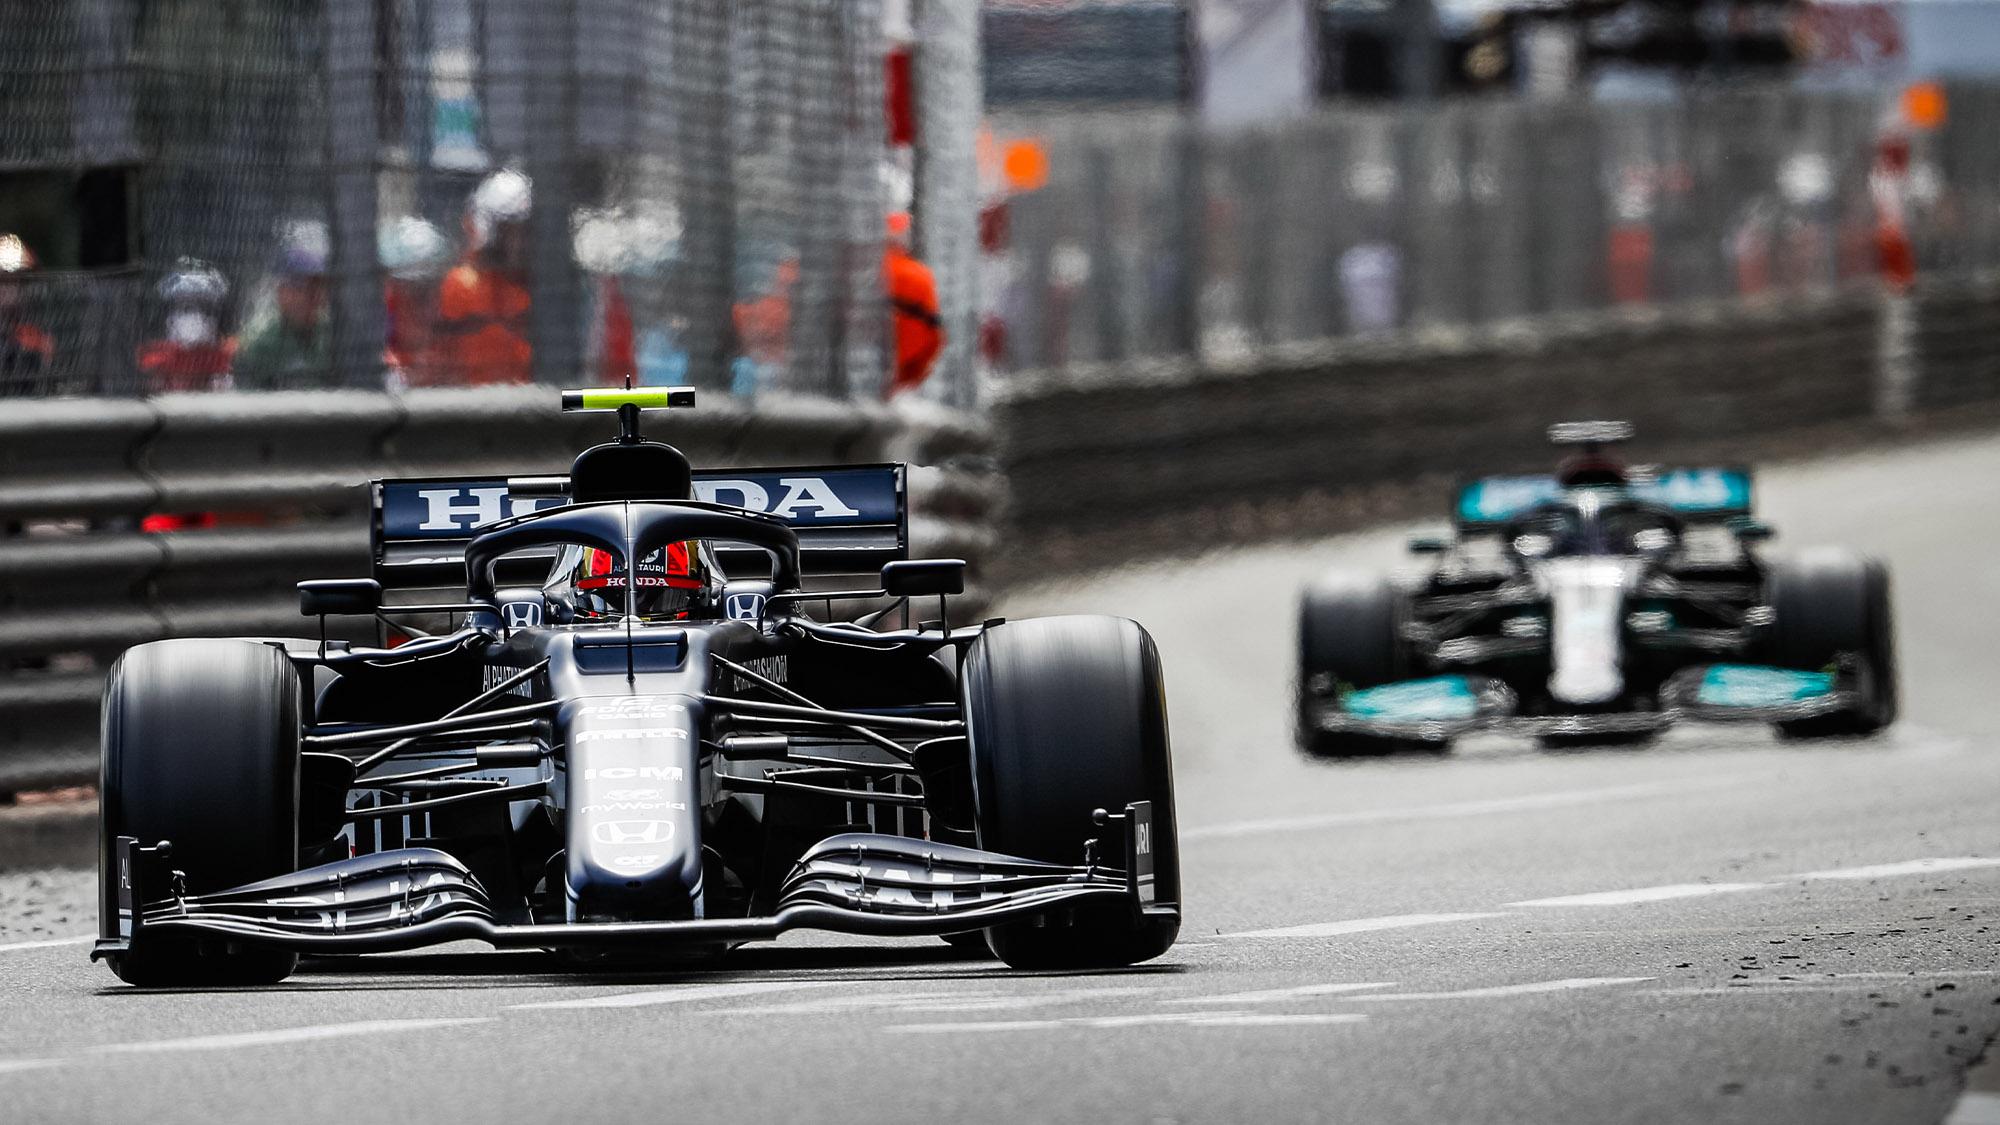 Pierre Gasly leads Lewis Hamilton at the 2021 Monaco Grand Prix